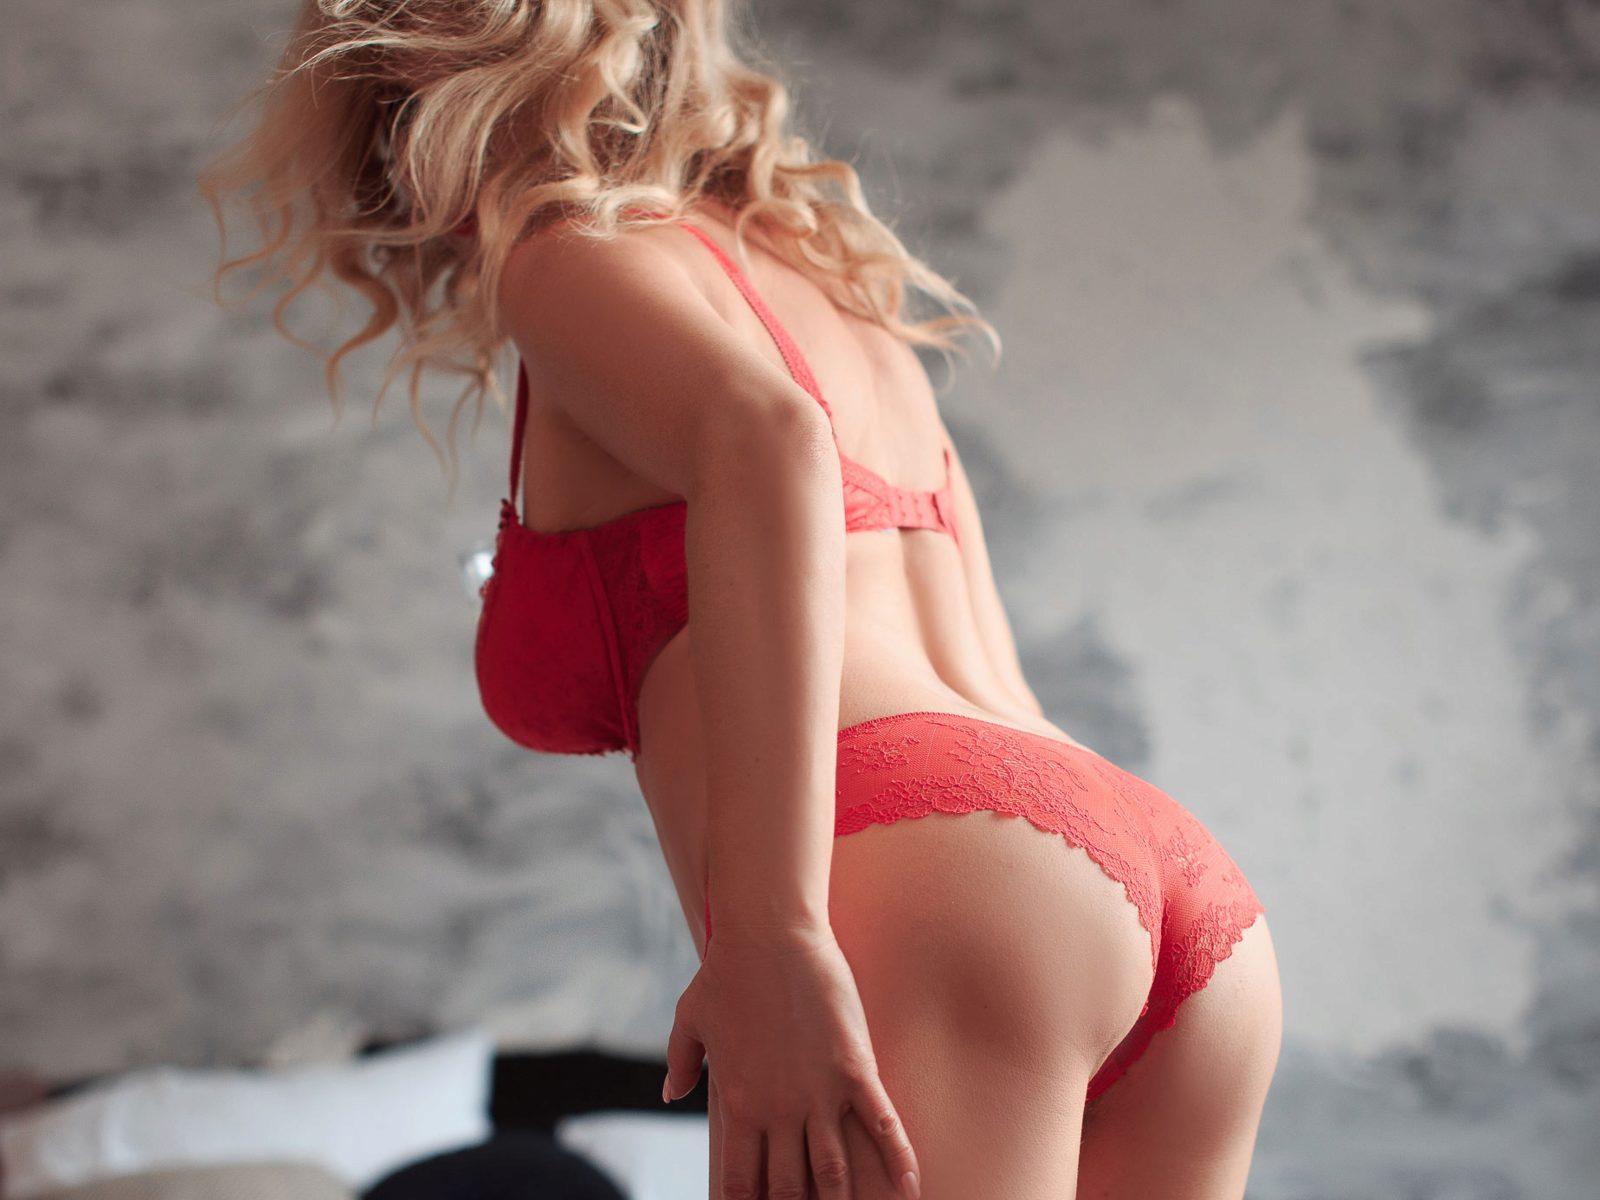 Julie marie berman nude cottage adult galerry abuse